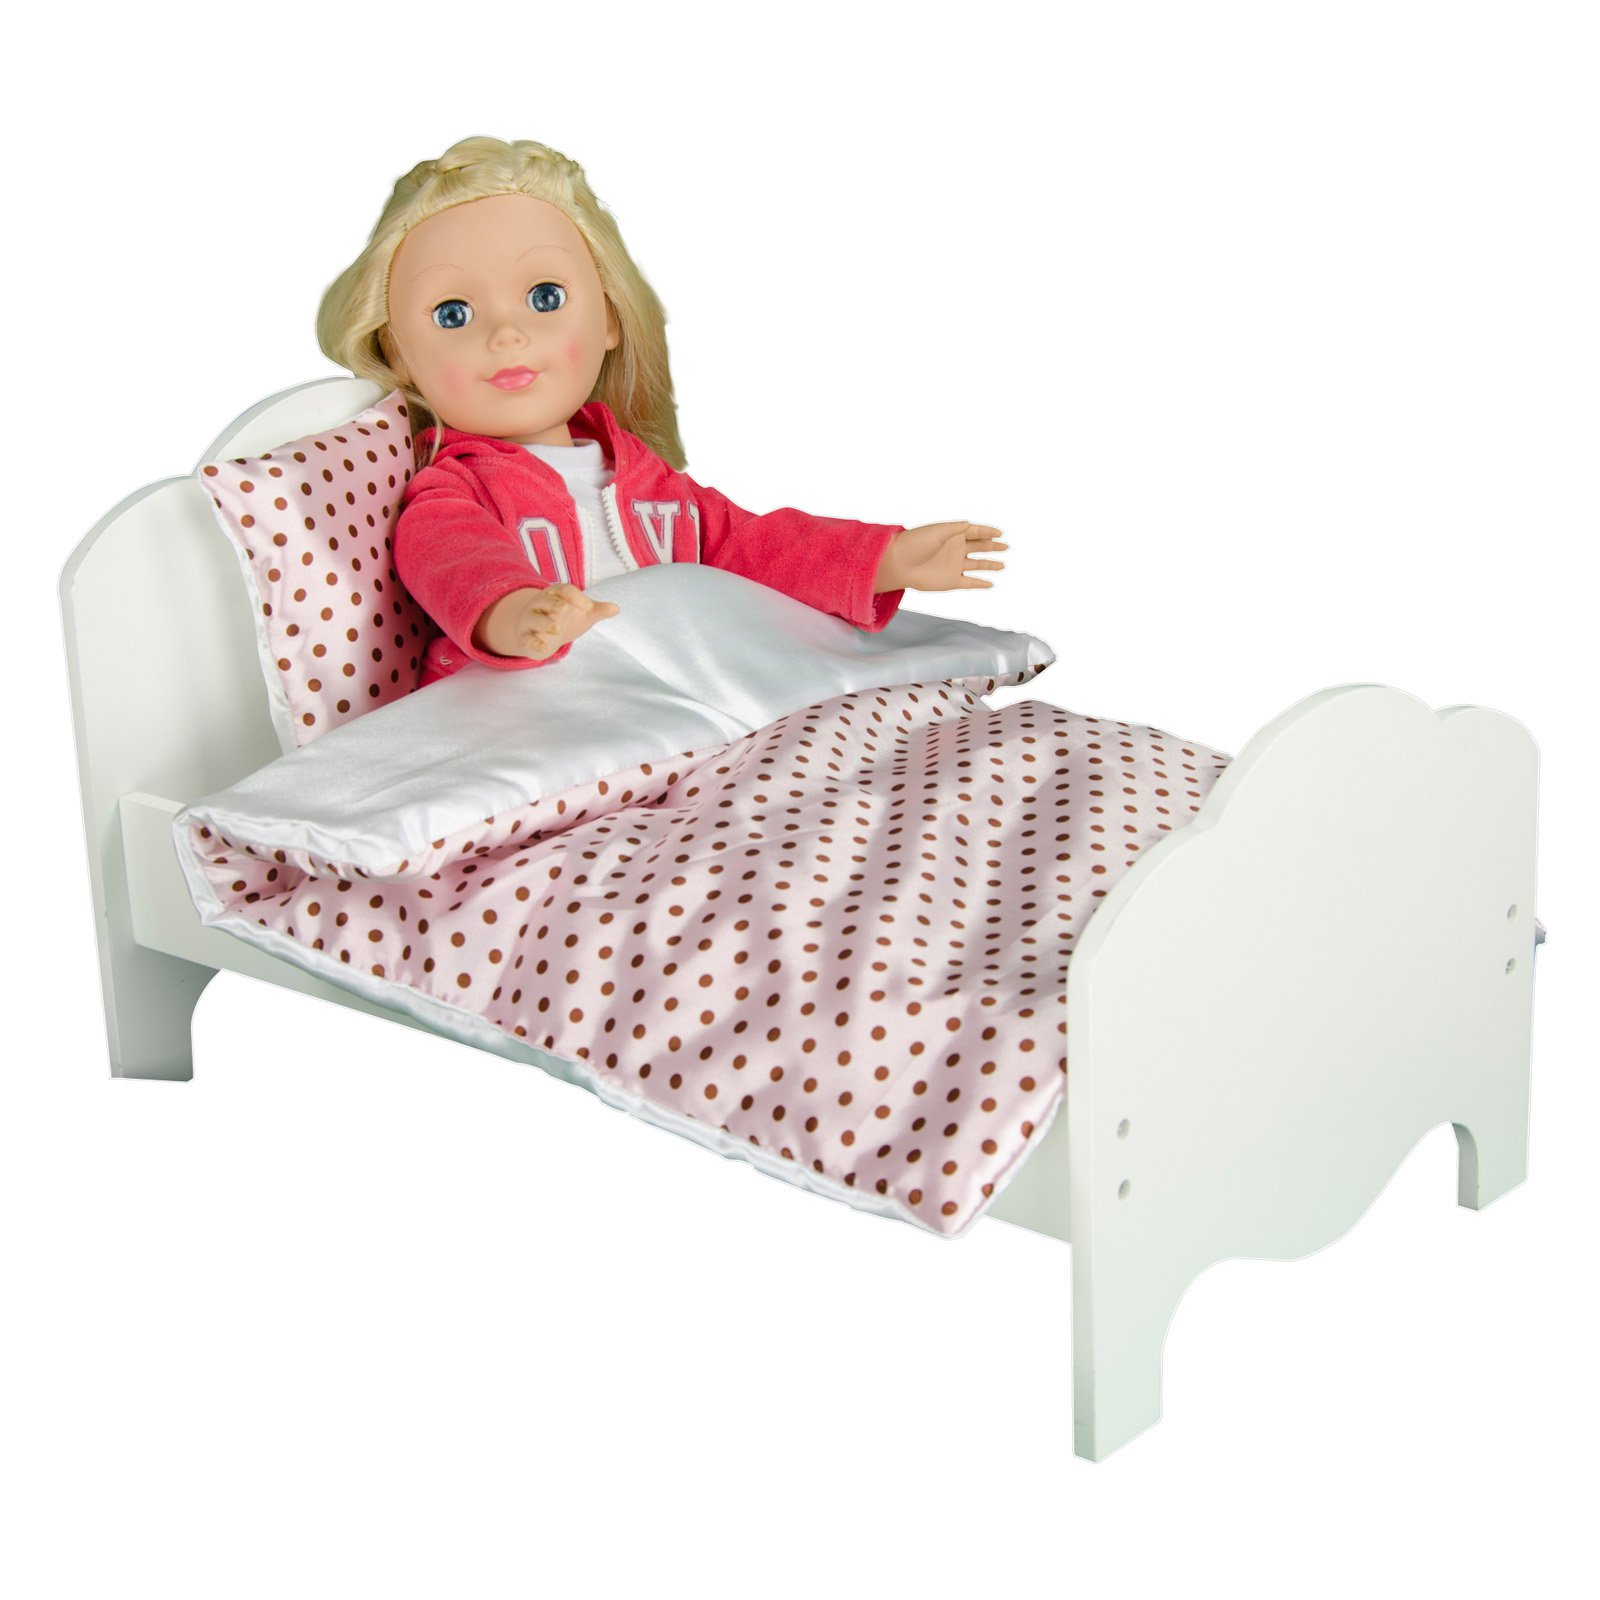 "Olivia's Little World - Little Princess 18"" Doll Single Bed & Bedding Set - Polka Dots"